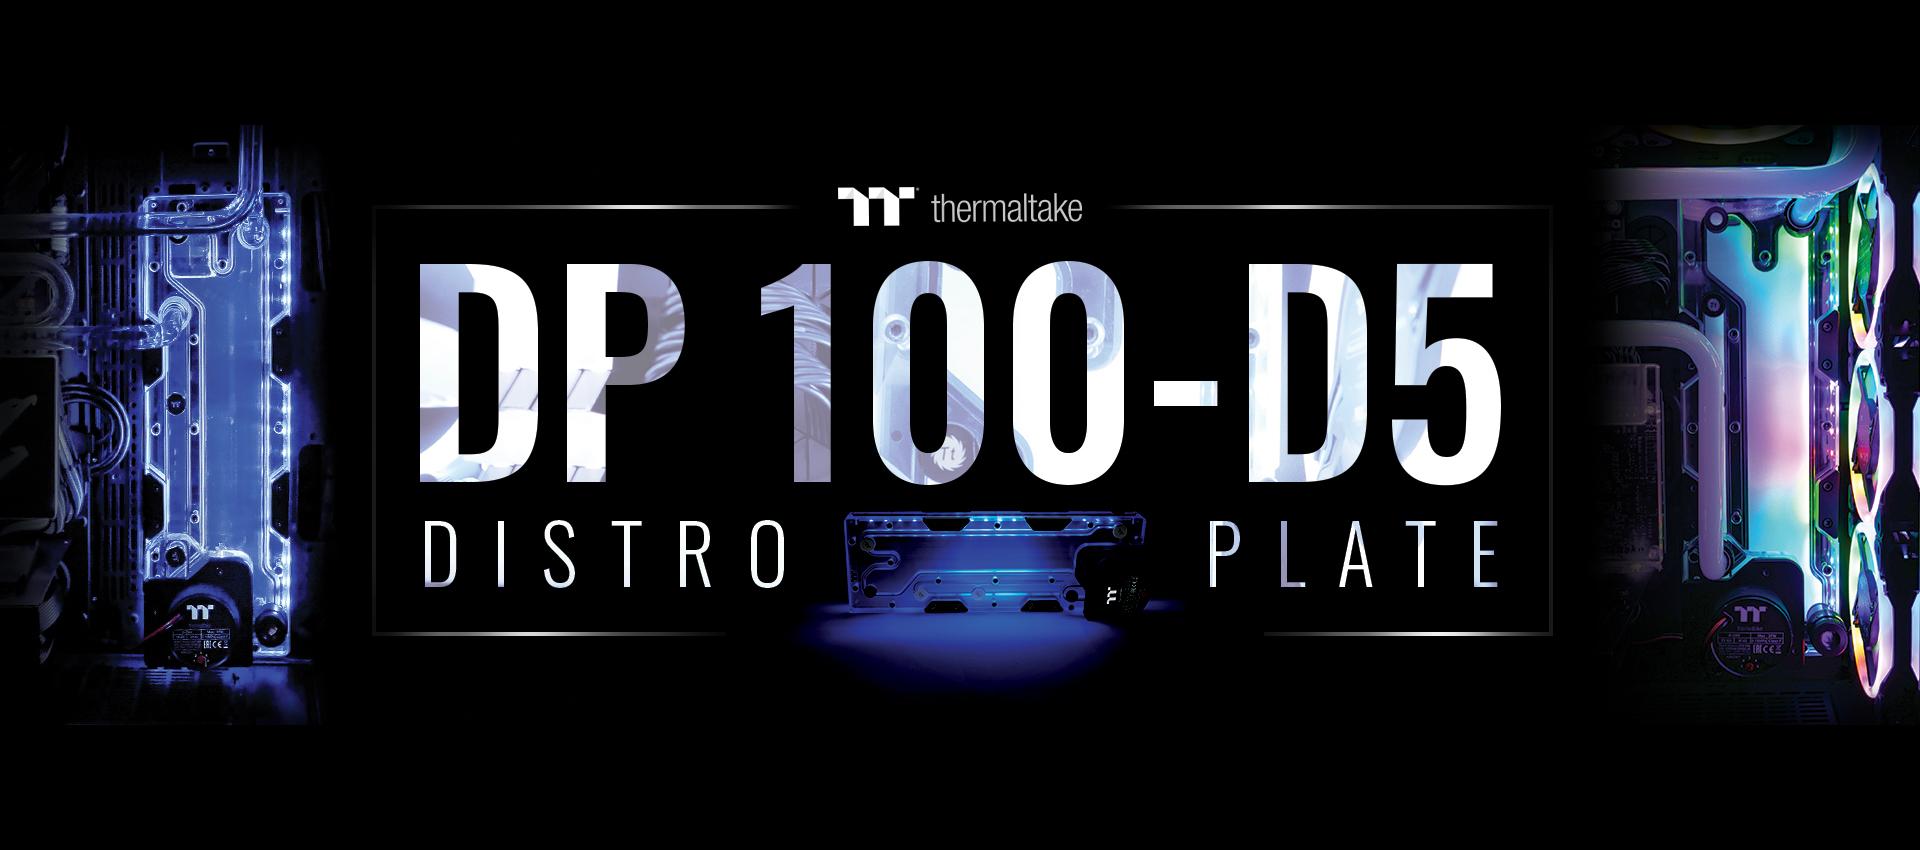 DP 100-D5 Distro Plate